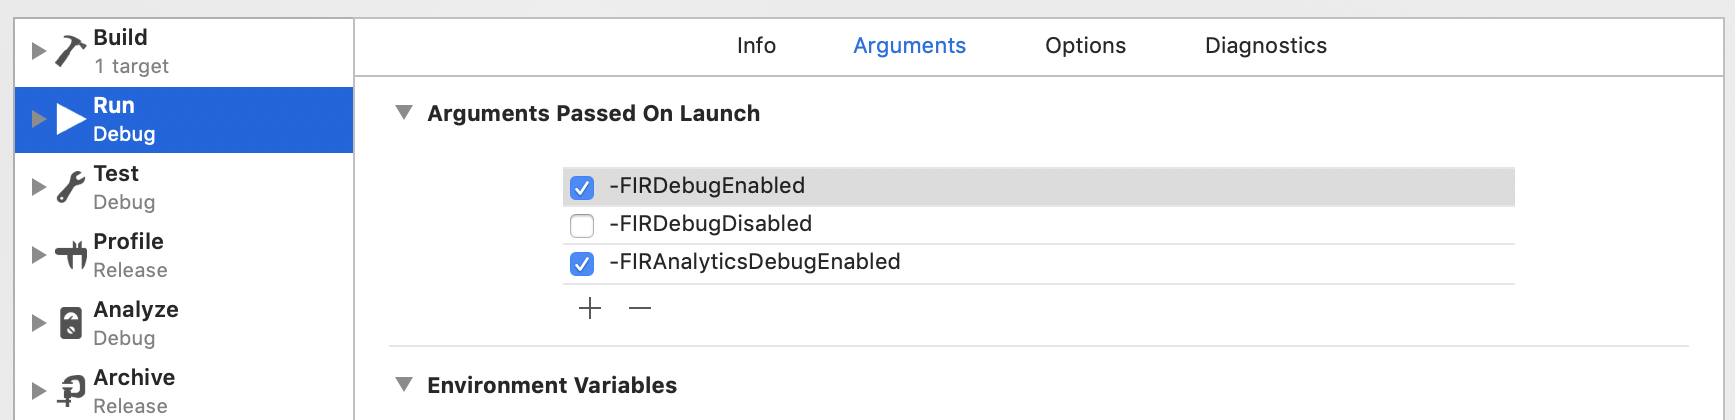 20190510-firebase-analytics-debug2.png